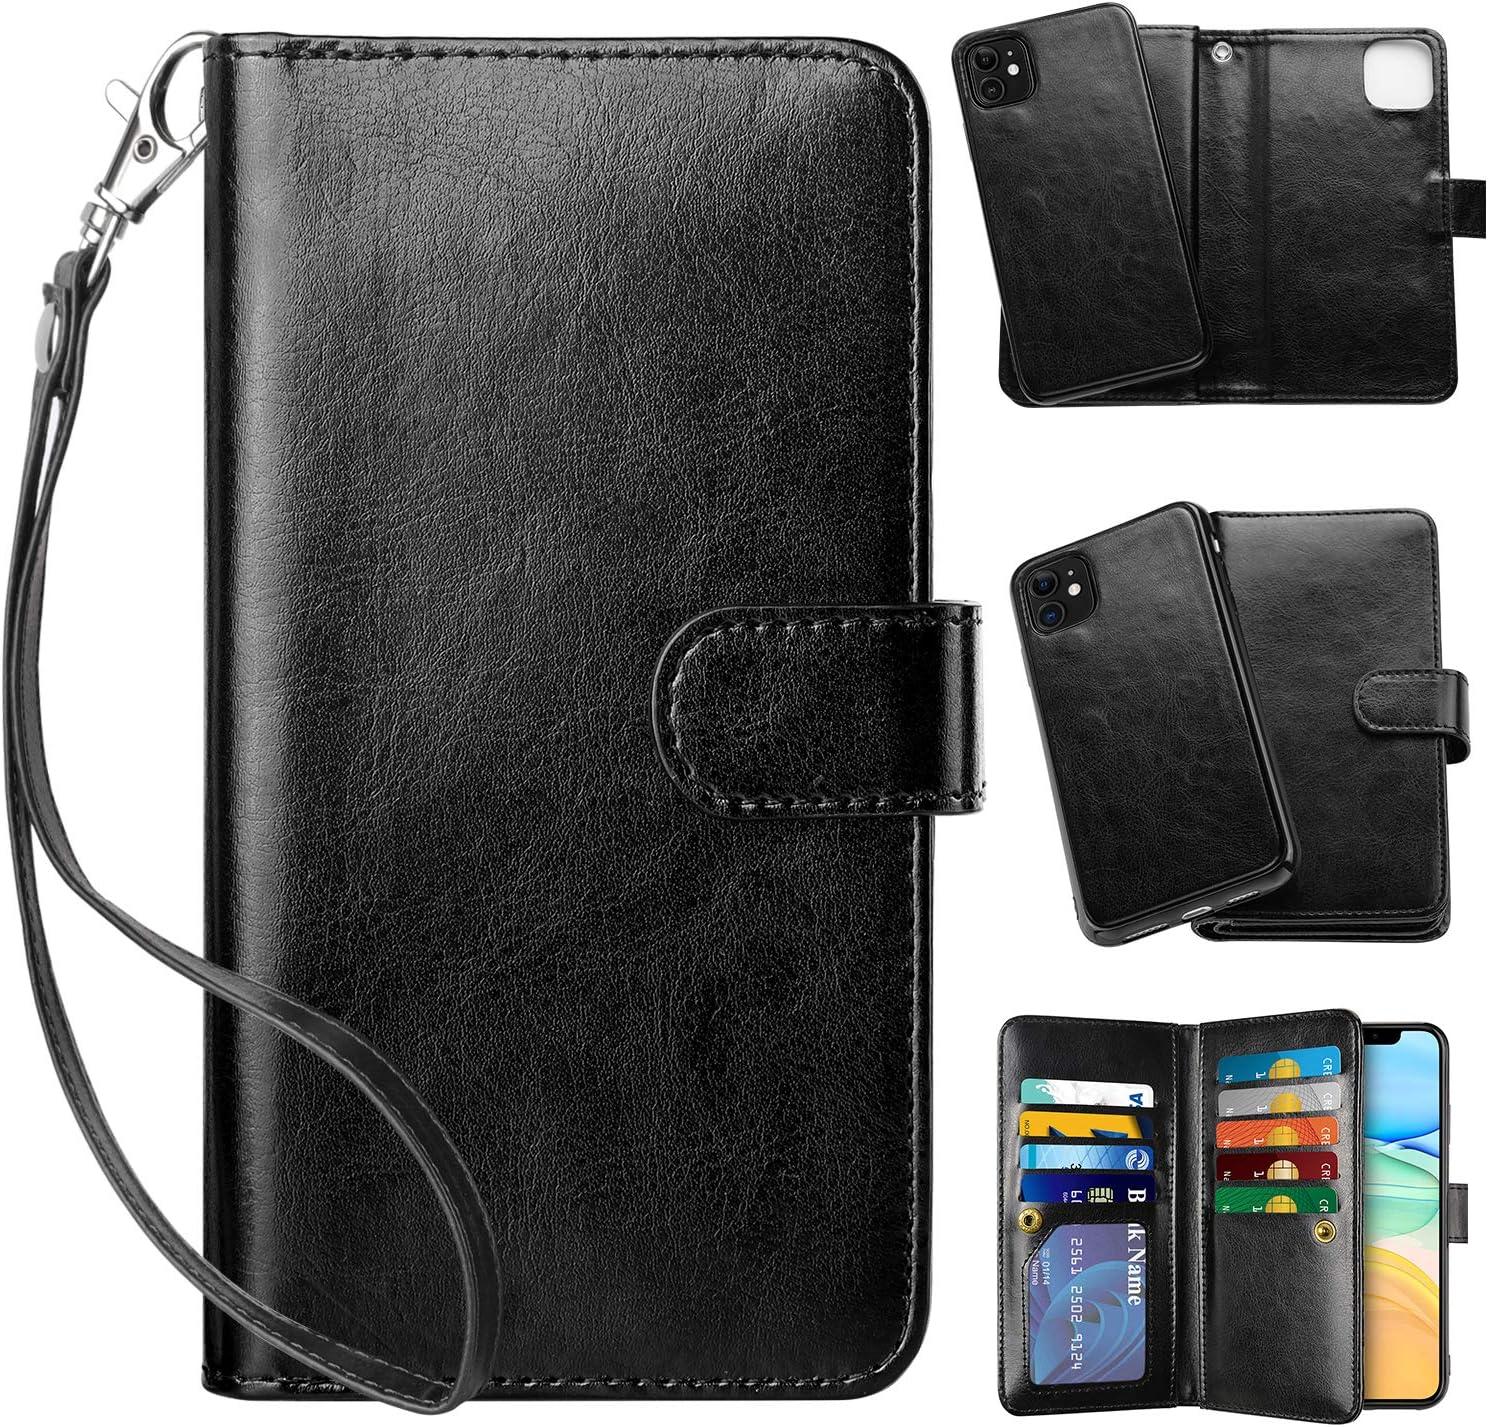 Vofolen 2-in-1 Case for iPhone 11 Case Wallet Credit Card Holder ID Slot Detachable Hybrid Protective Slim Hard Shell Magnetic PU Leather Folio Pocket Flip Cover for iPhone 11 6.1 inch (Black)